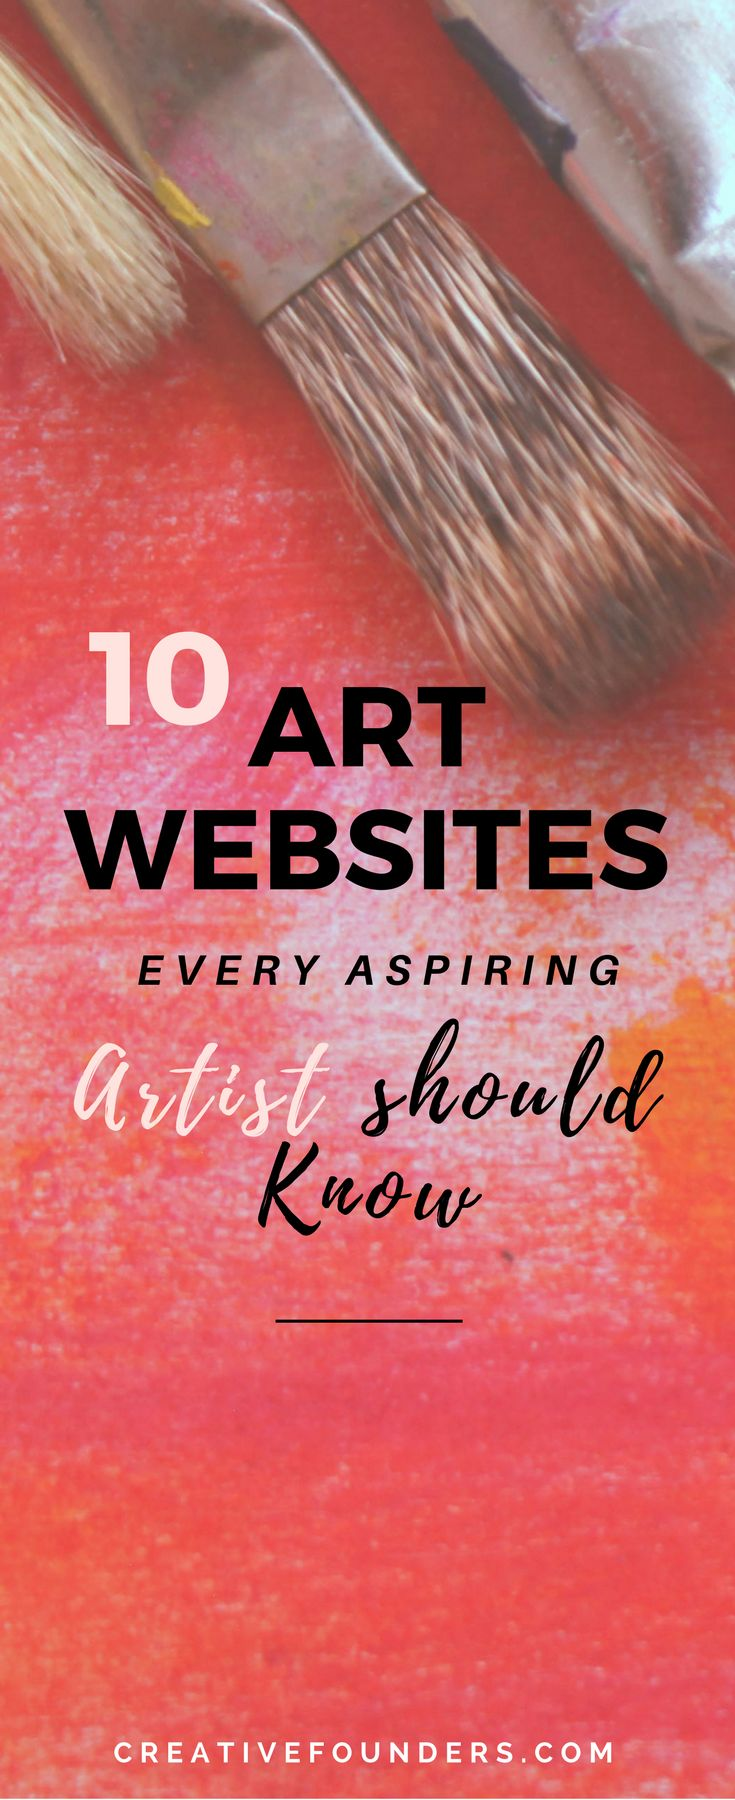 Artist Marketing Resource // ArtMaze Mag // Carve Out Time for Art // The Jealous Curator // The Artist Market Co. // Creative Boom // Maria Brophy // The Art Biz Blog // Artsy Shark // The Abundant Artist // Creative Founders // Creativefounders.com